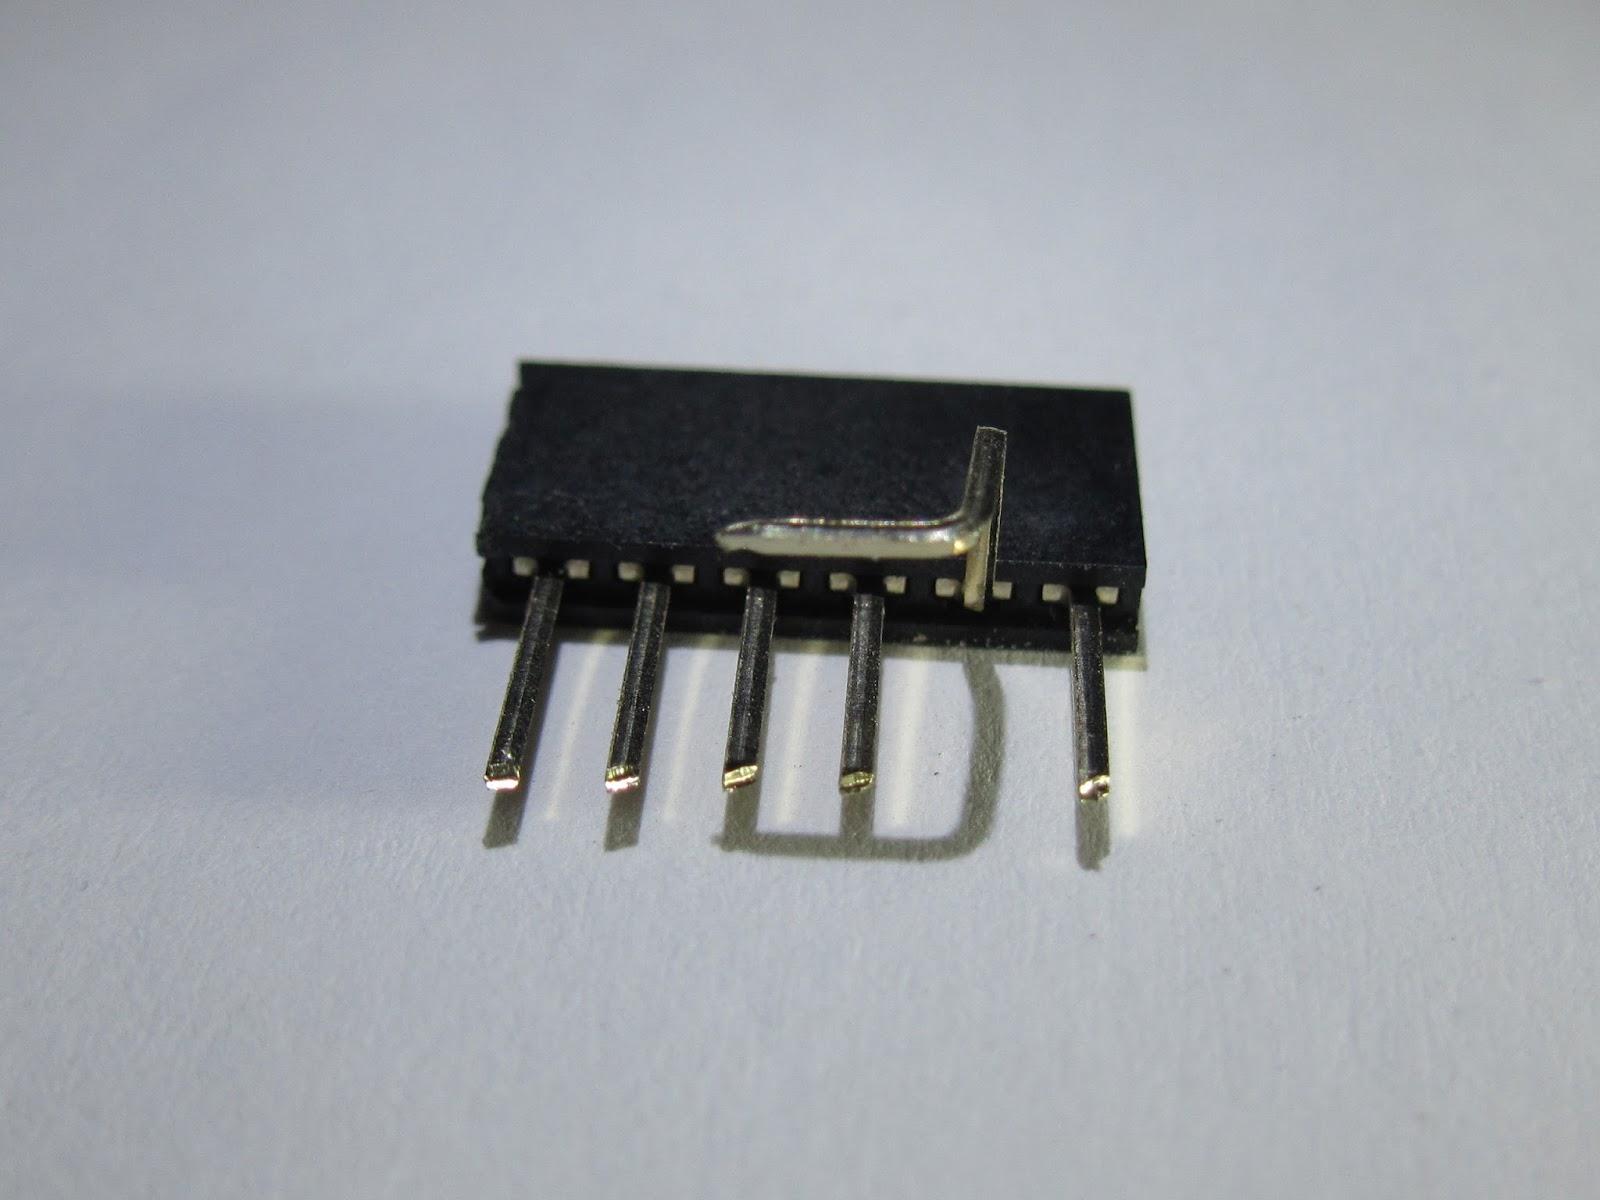 Willy Tarreau's stuff: What ESP8266 modules should look like